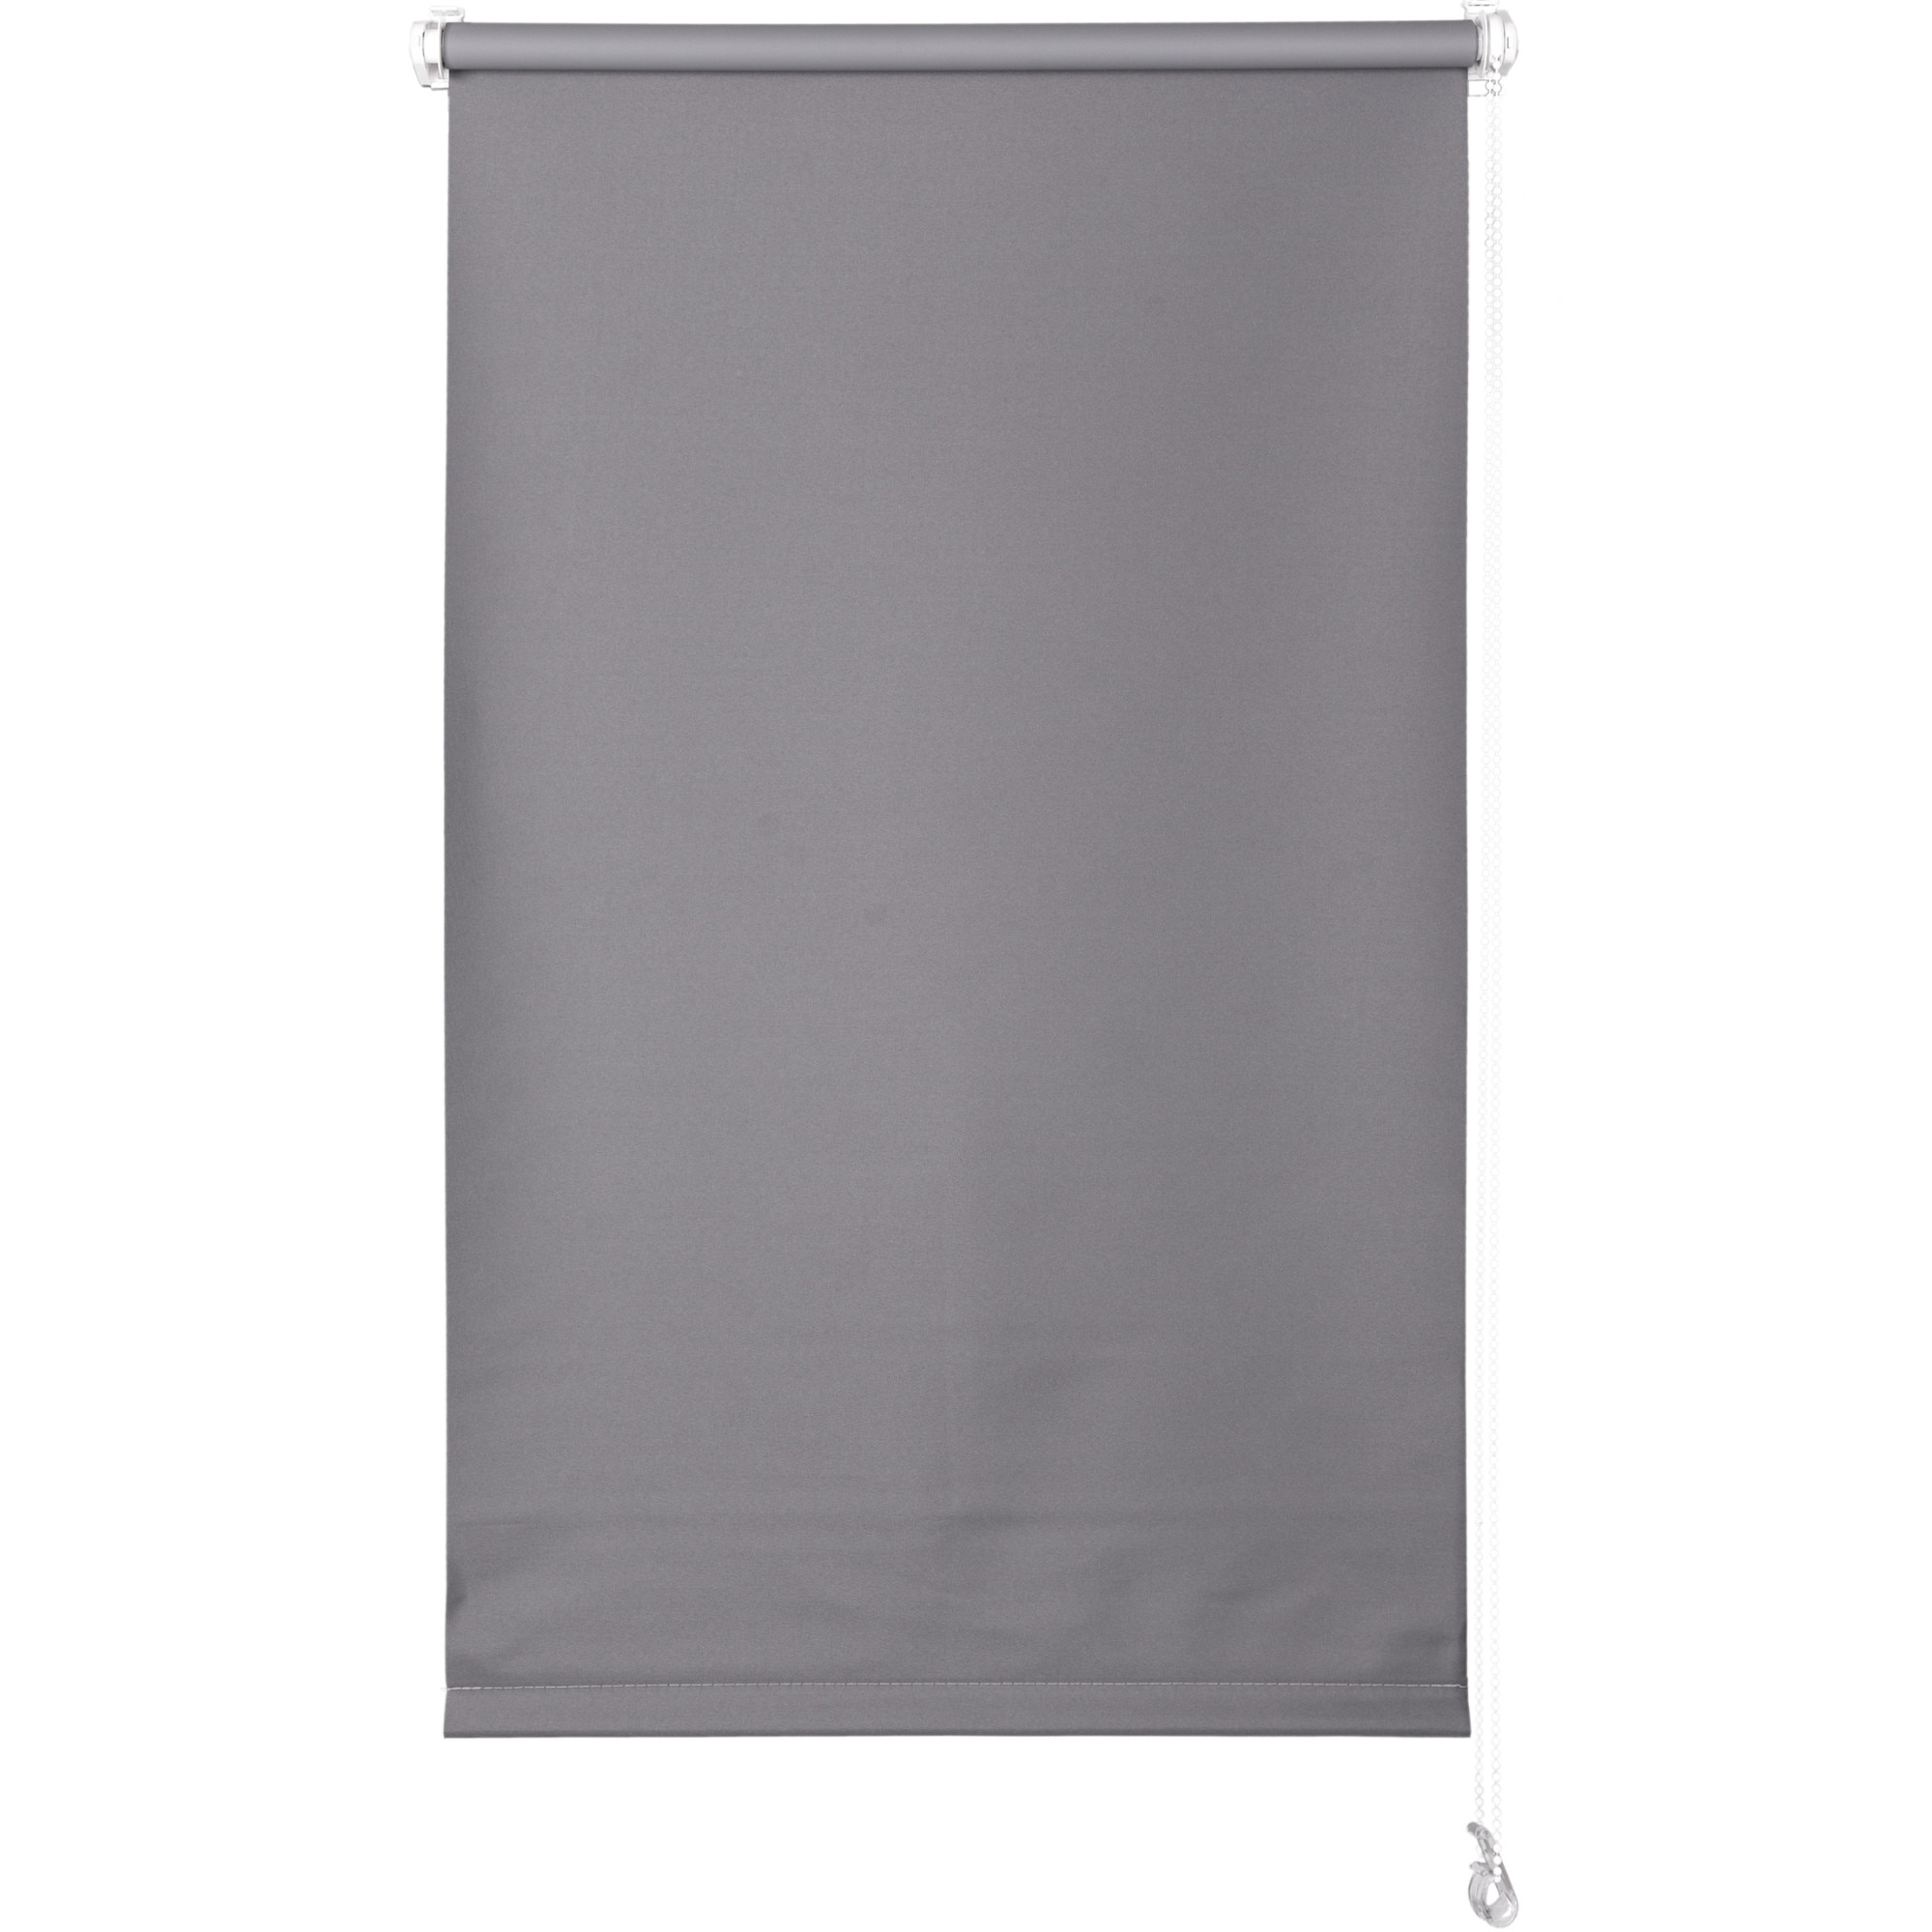 Fotografie Rulou textil opac blackout Kring, 100 % poliester, 190 gsm, 56x150 cm, Gri